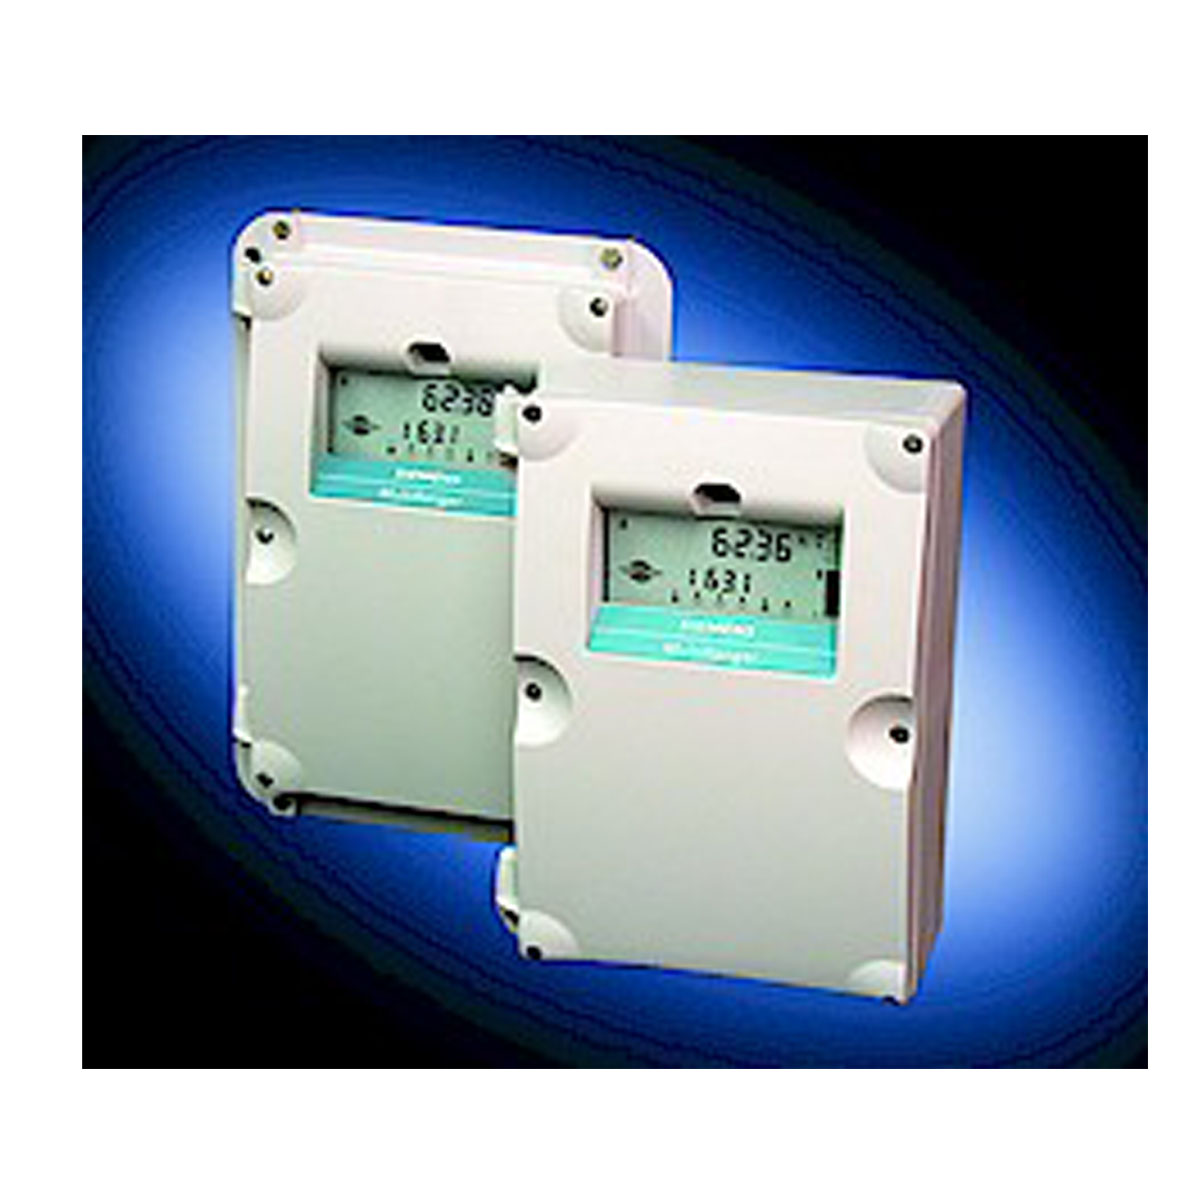 SIEMENS MULTIRANGER100/200 เครื่องวัดระดับของเหลวและผงเมล็ดแบบอัลตร้าโซนิค